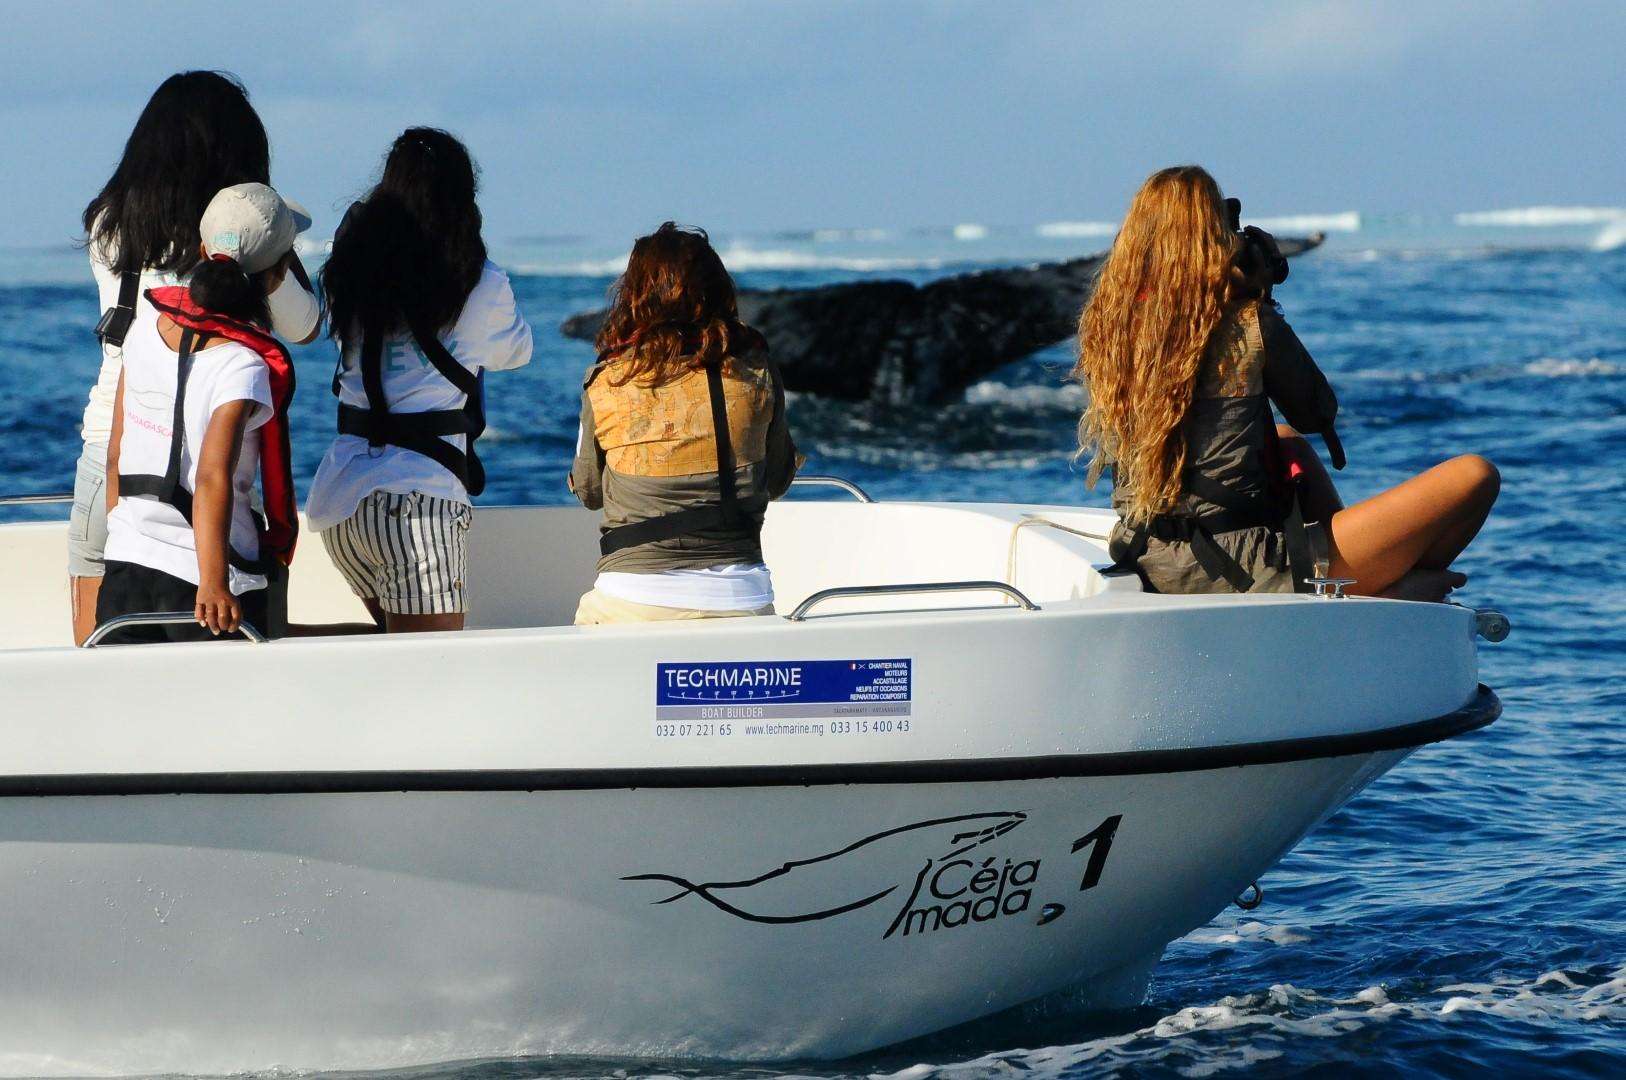 Donnavventura in Madagascar: a tu per tu con le balene